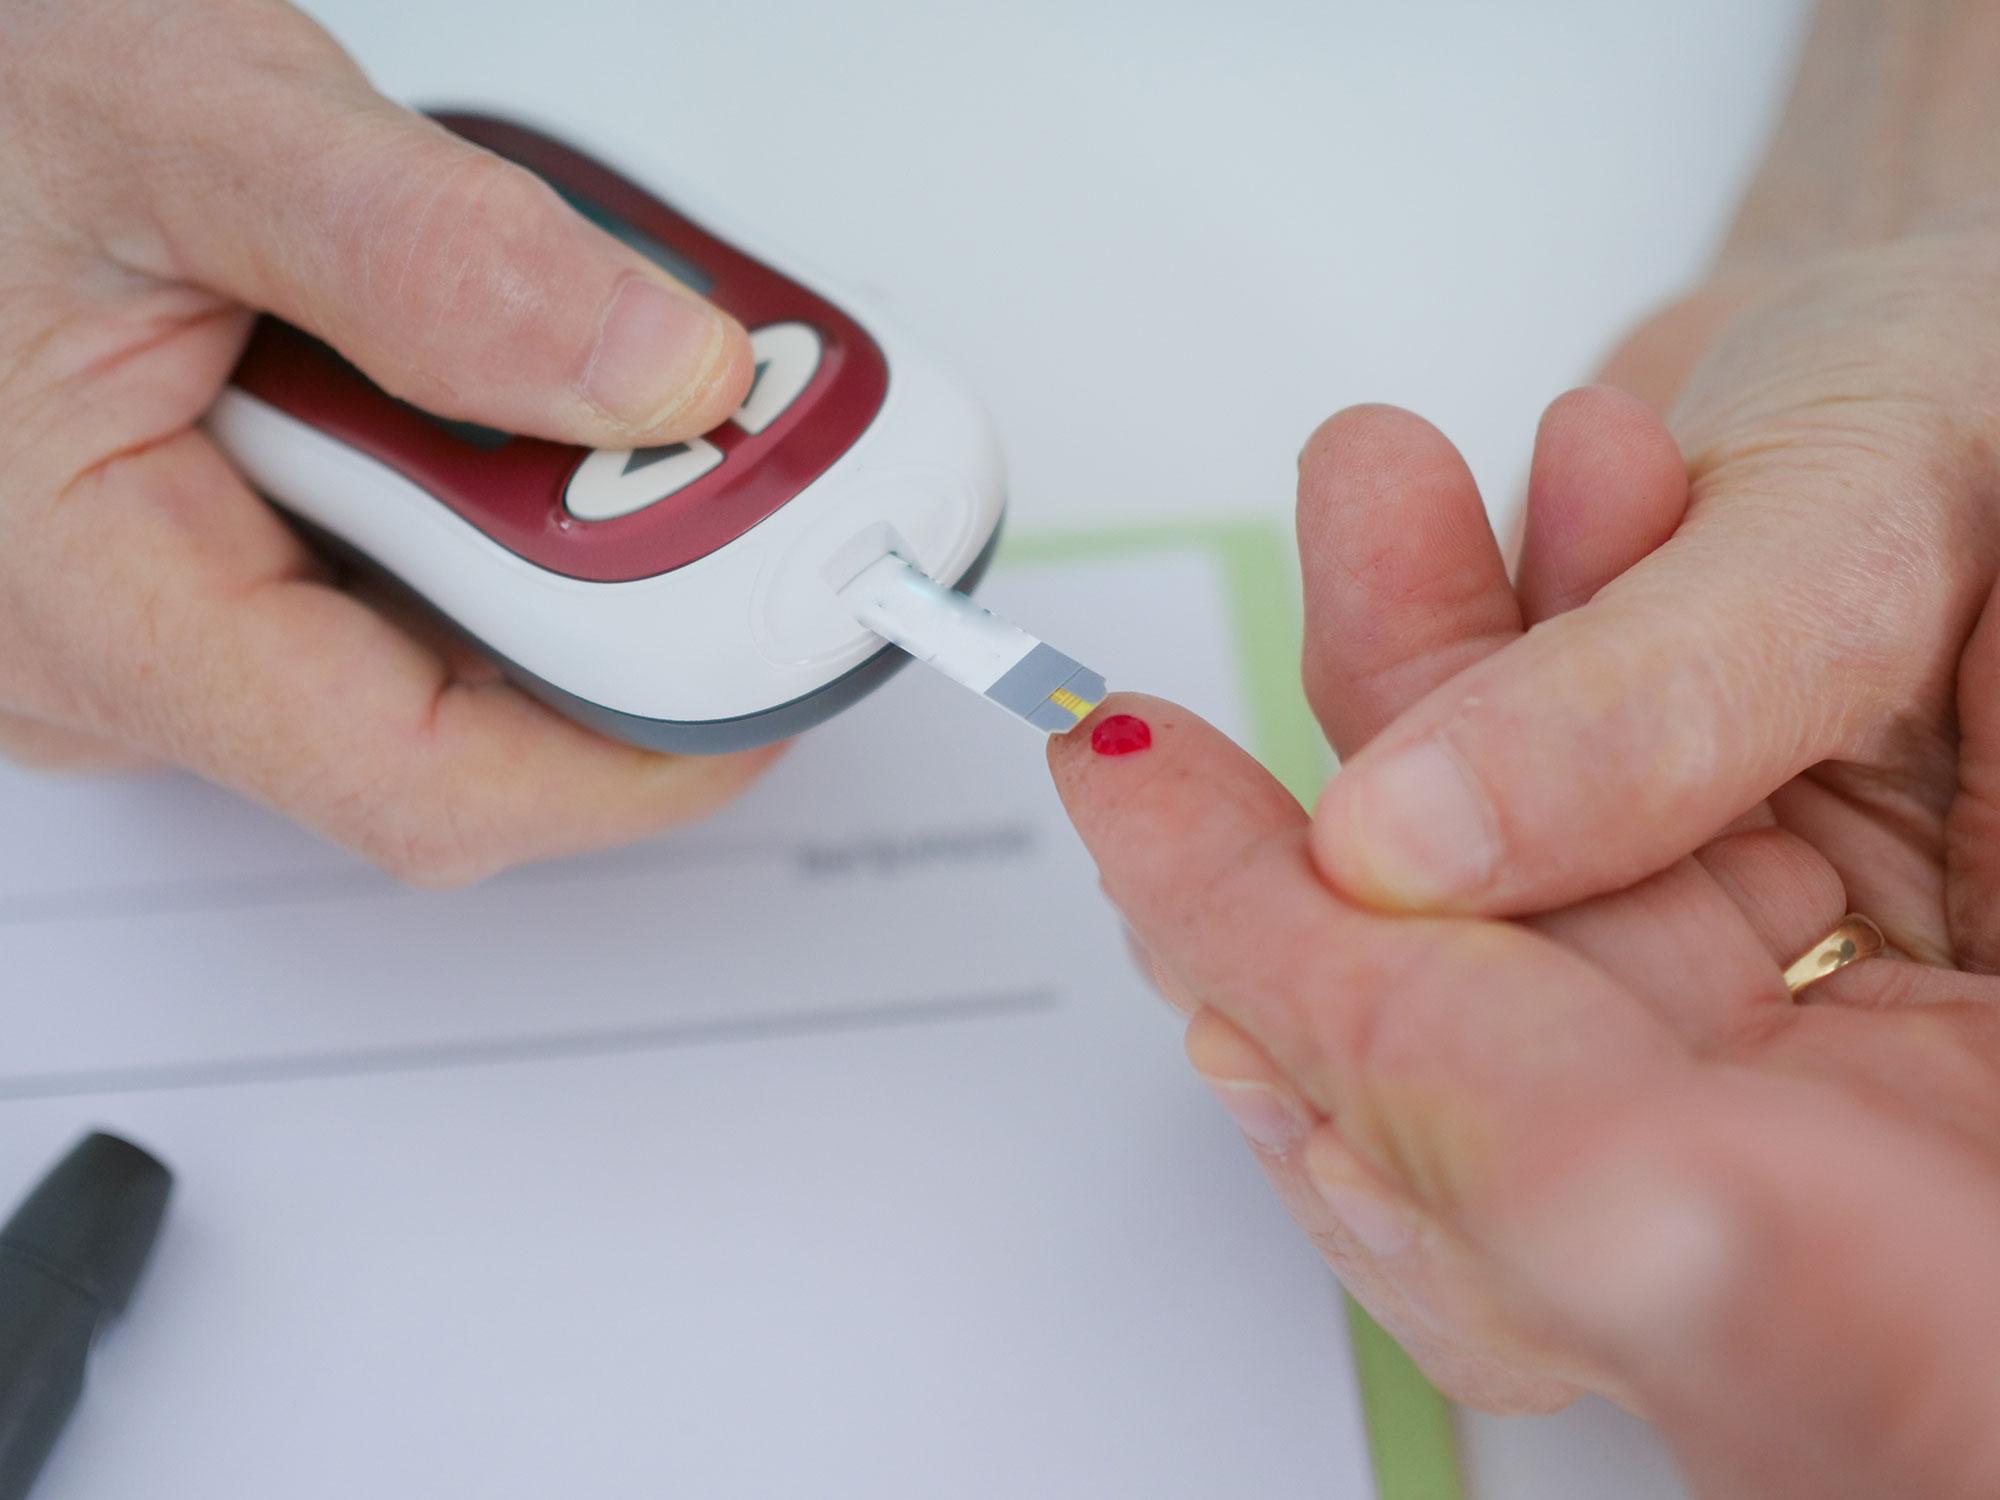 diabetes-blood-sugar-check.jpg